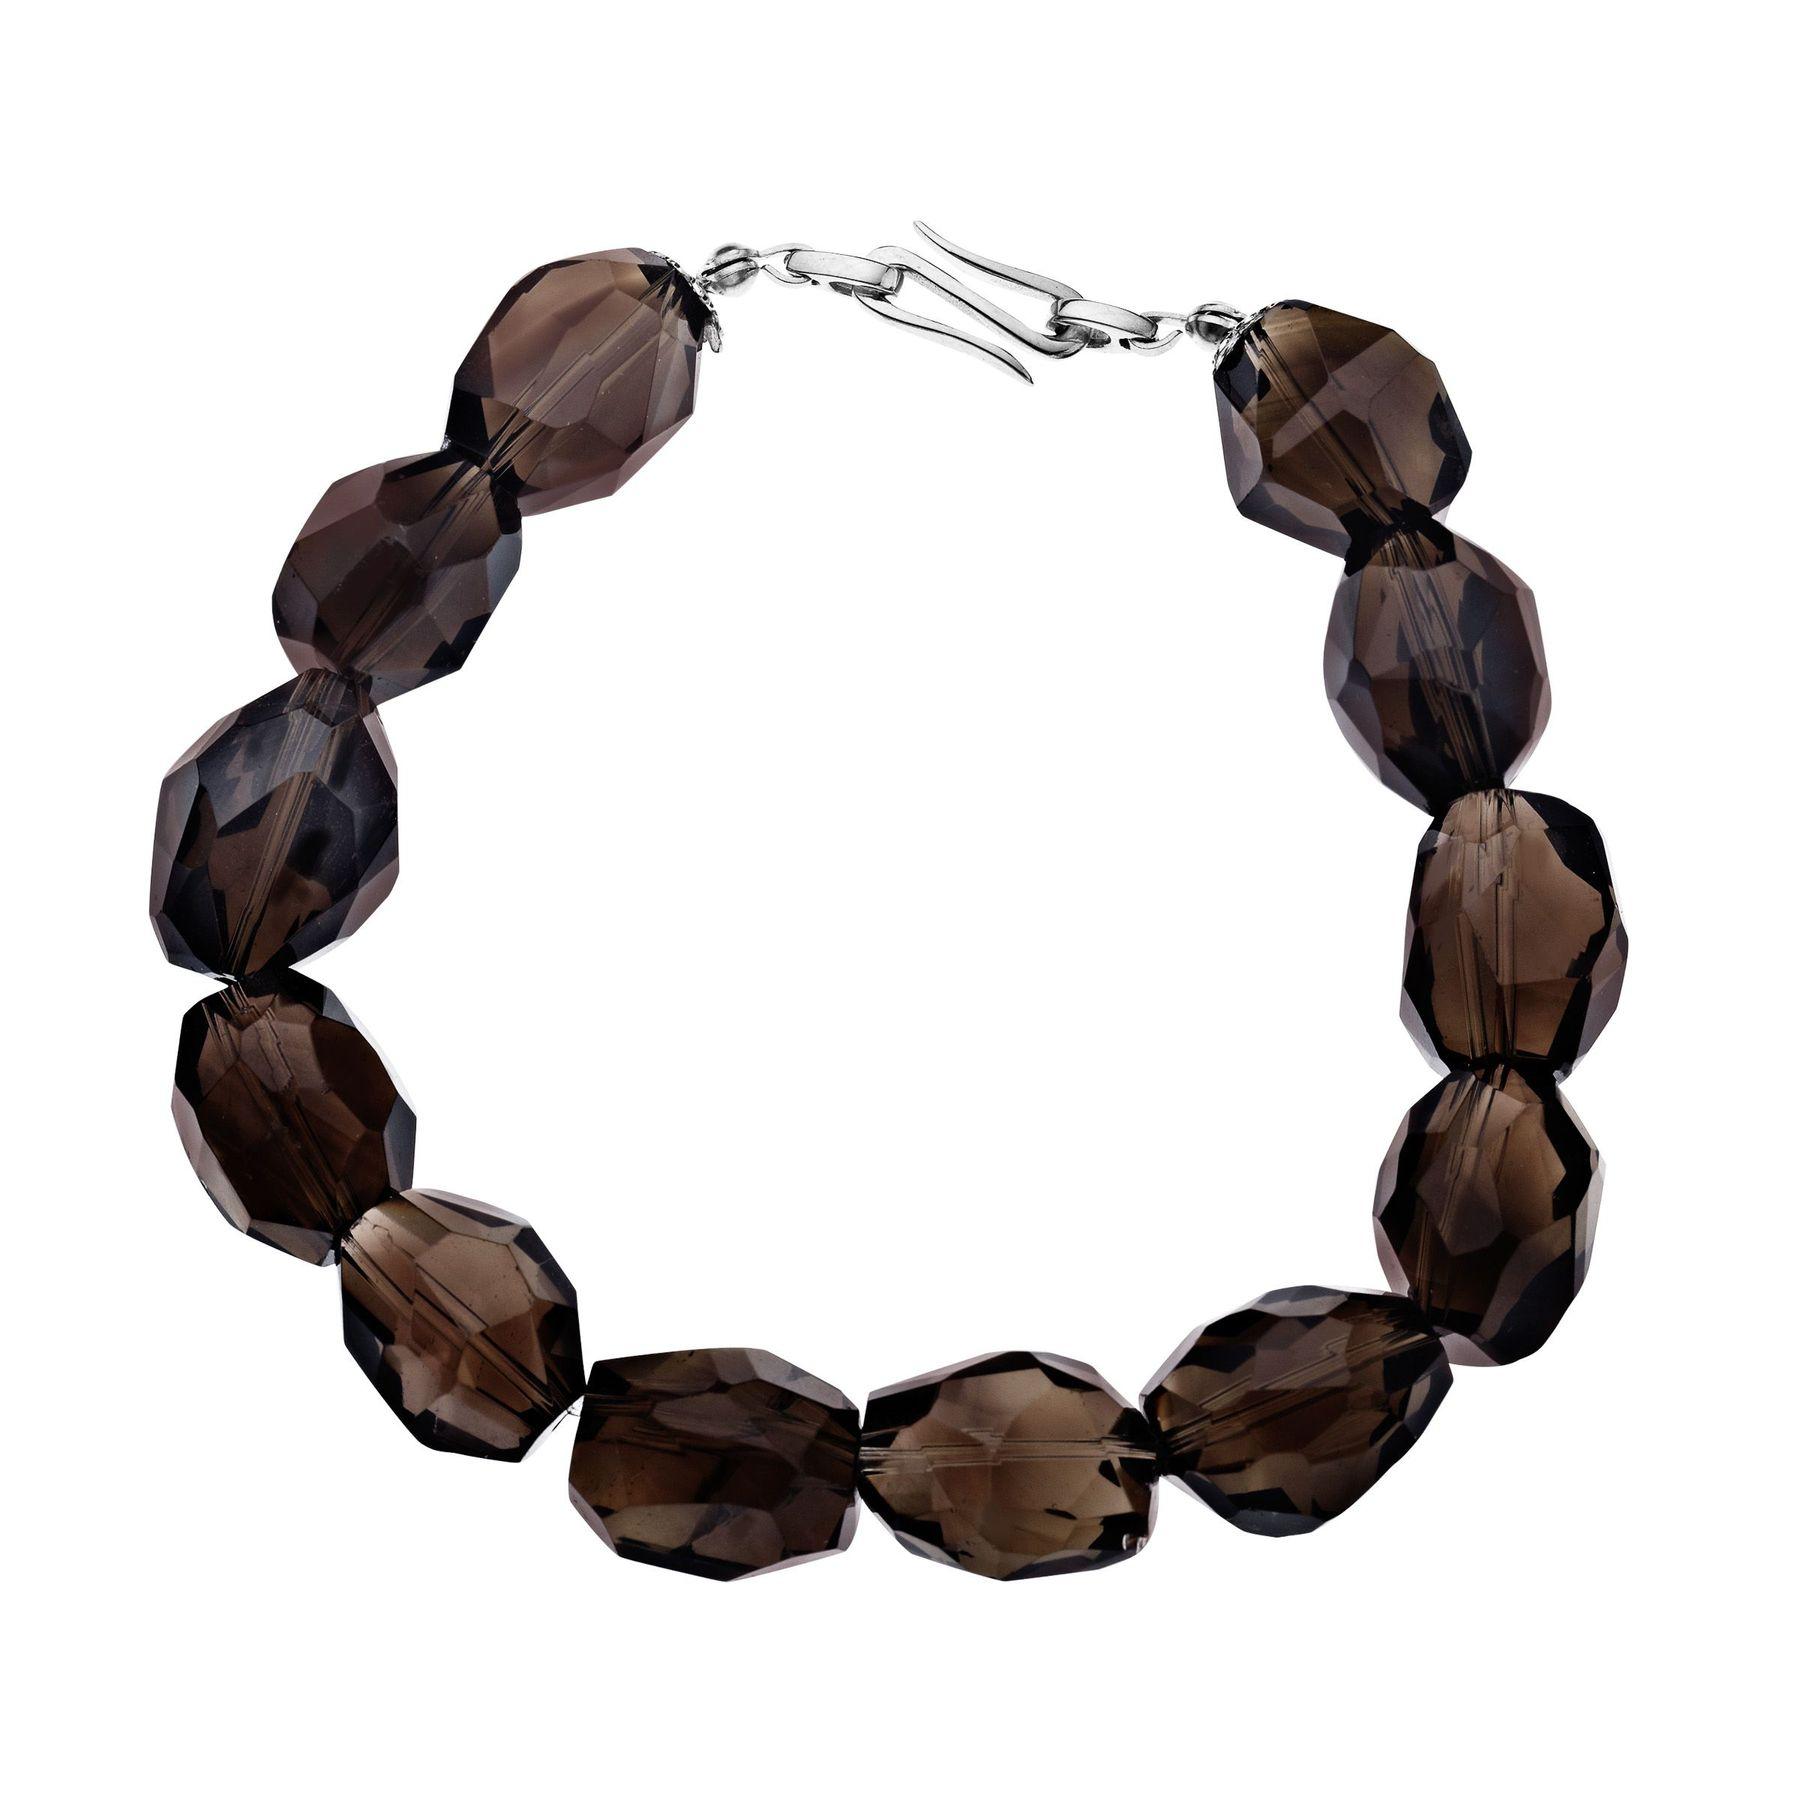 202 Ct Smokey Quartz Bracelet